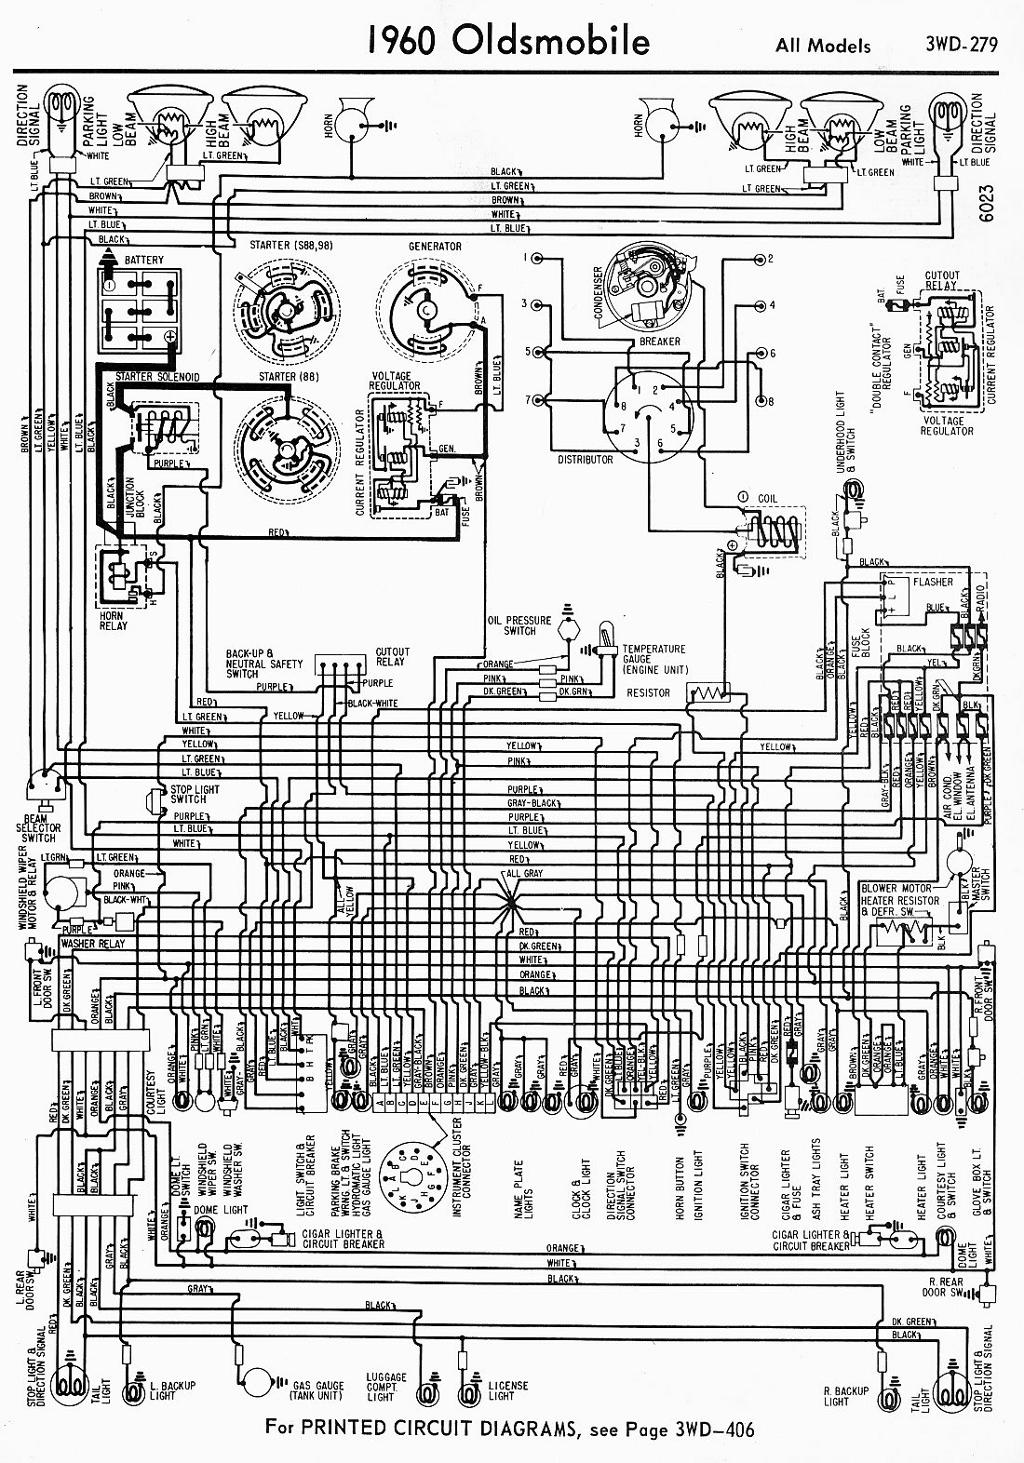 Wiring Diagram Oldsmobile Wiring Diagrams Volvo Wiring Diagrams 1997